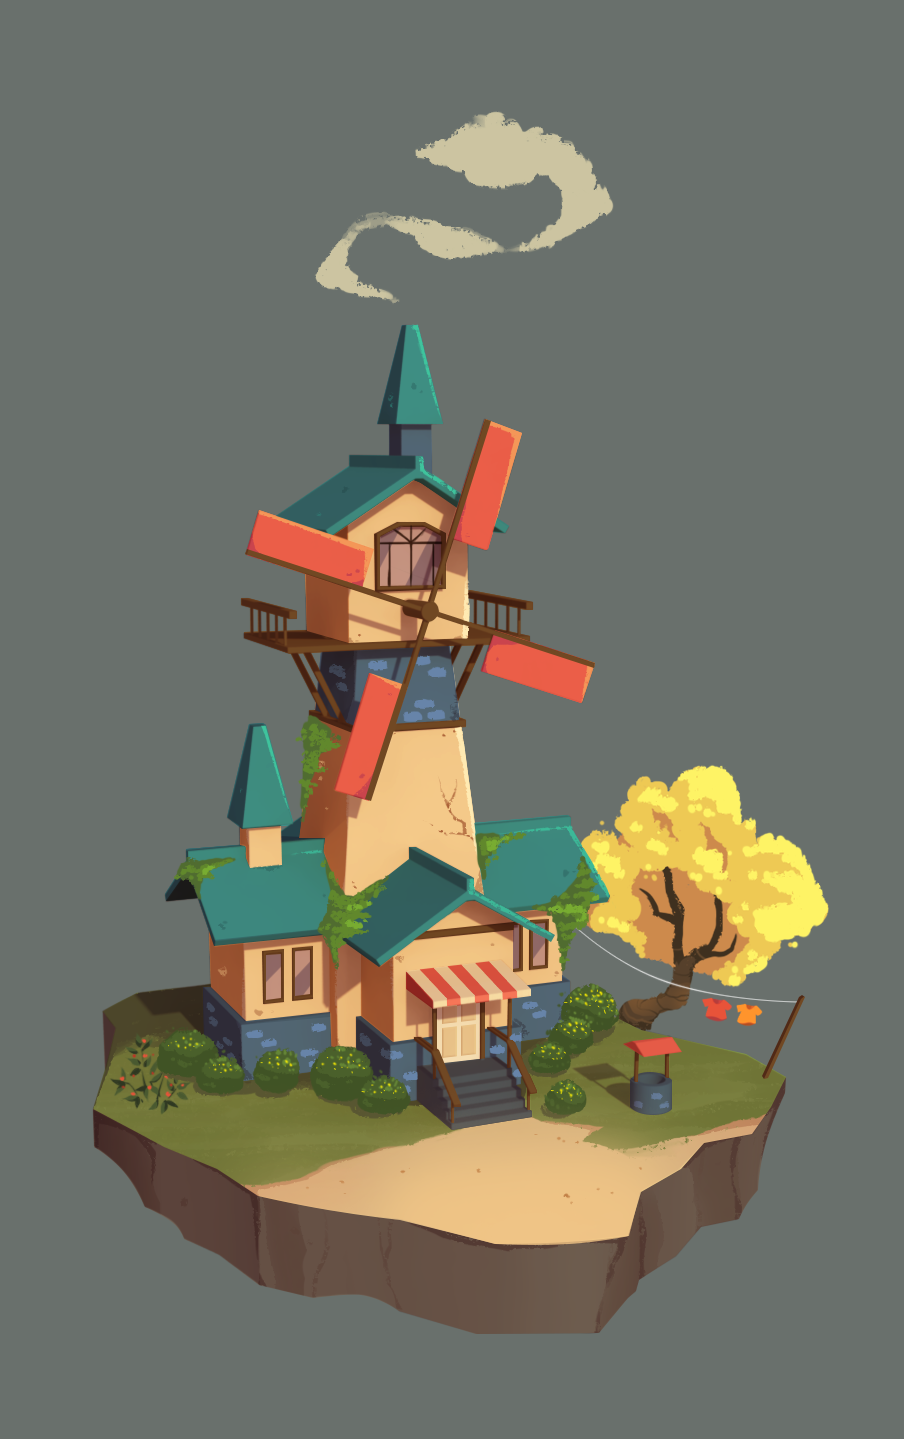 Dream house ii on behance dessins pinterest dessin